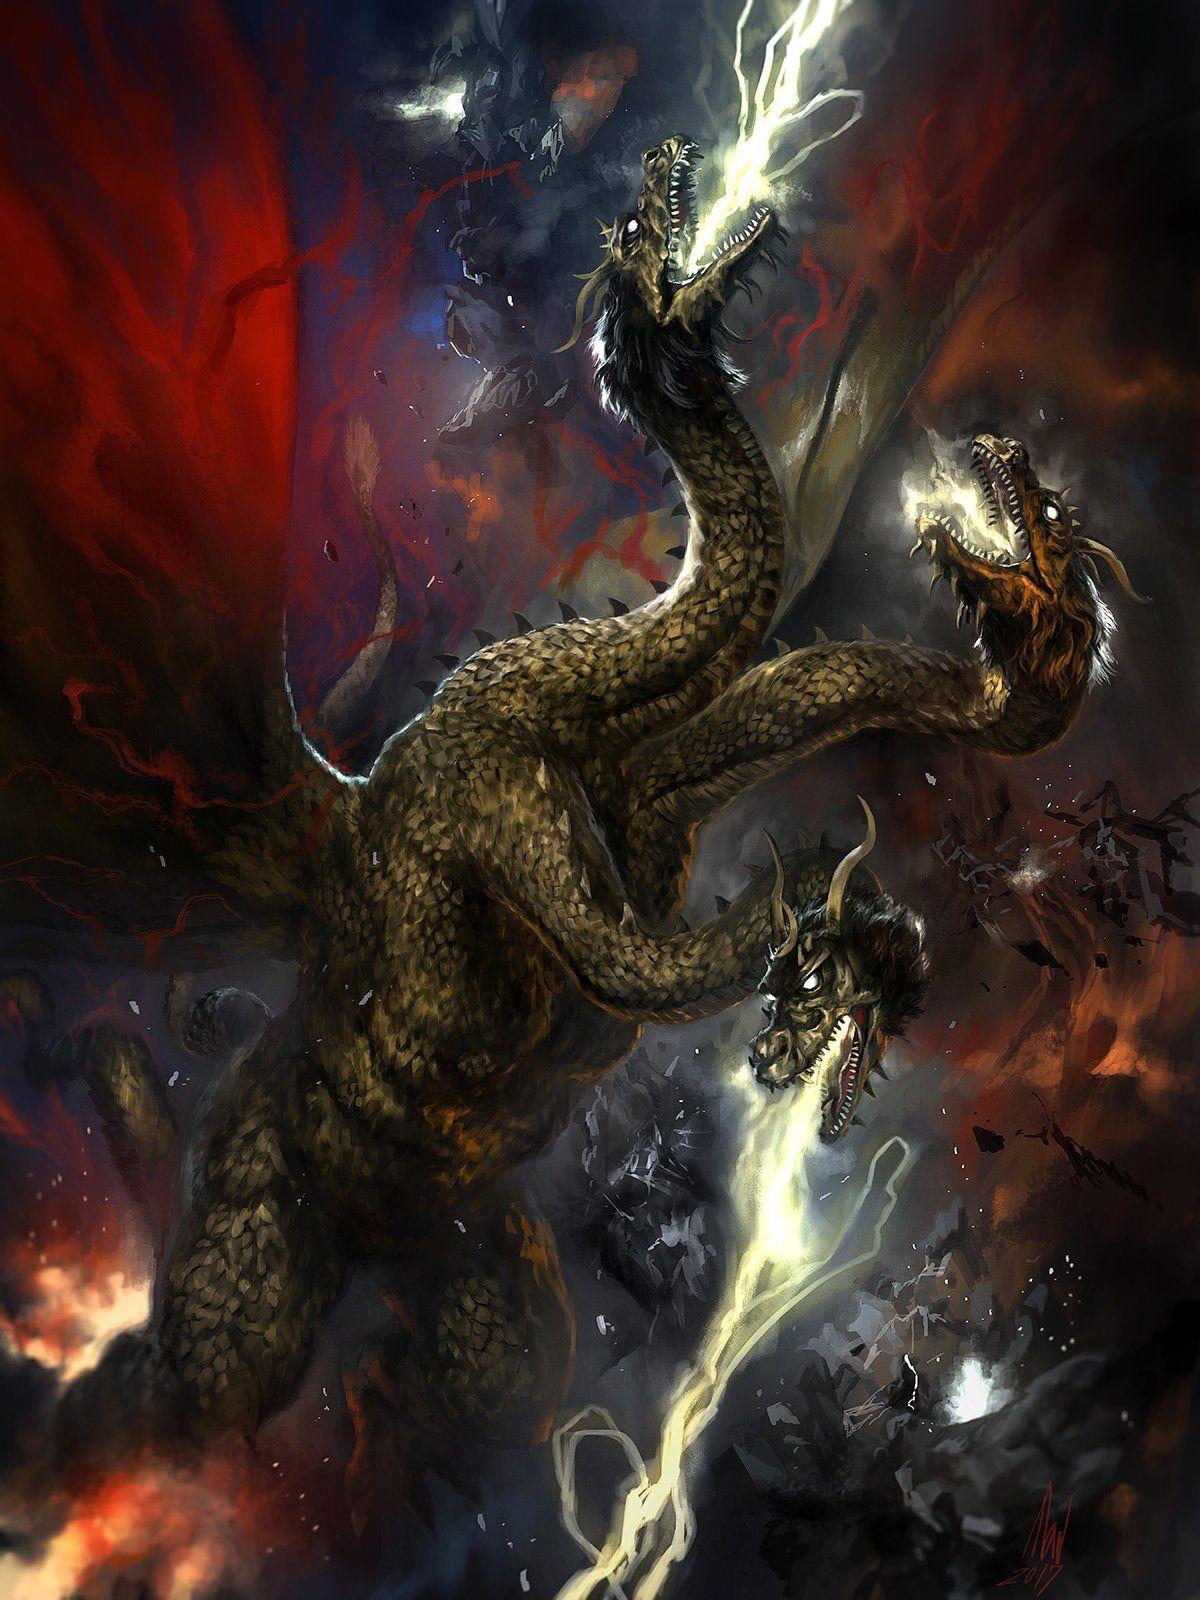 King Ghidorah art Godzilla Godzilla tattoo Japanese monster 1200x1600